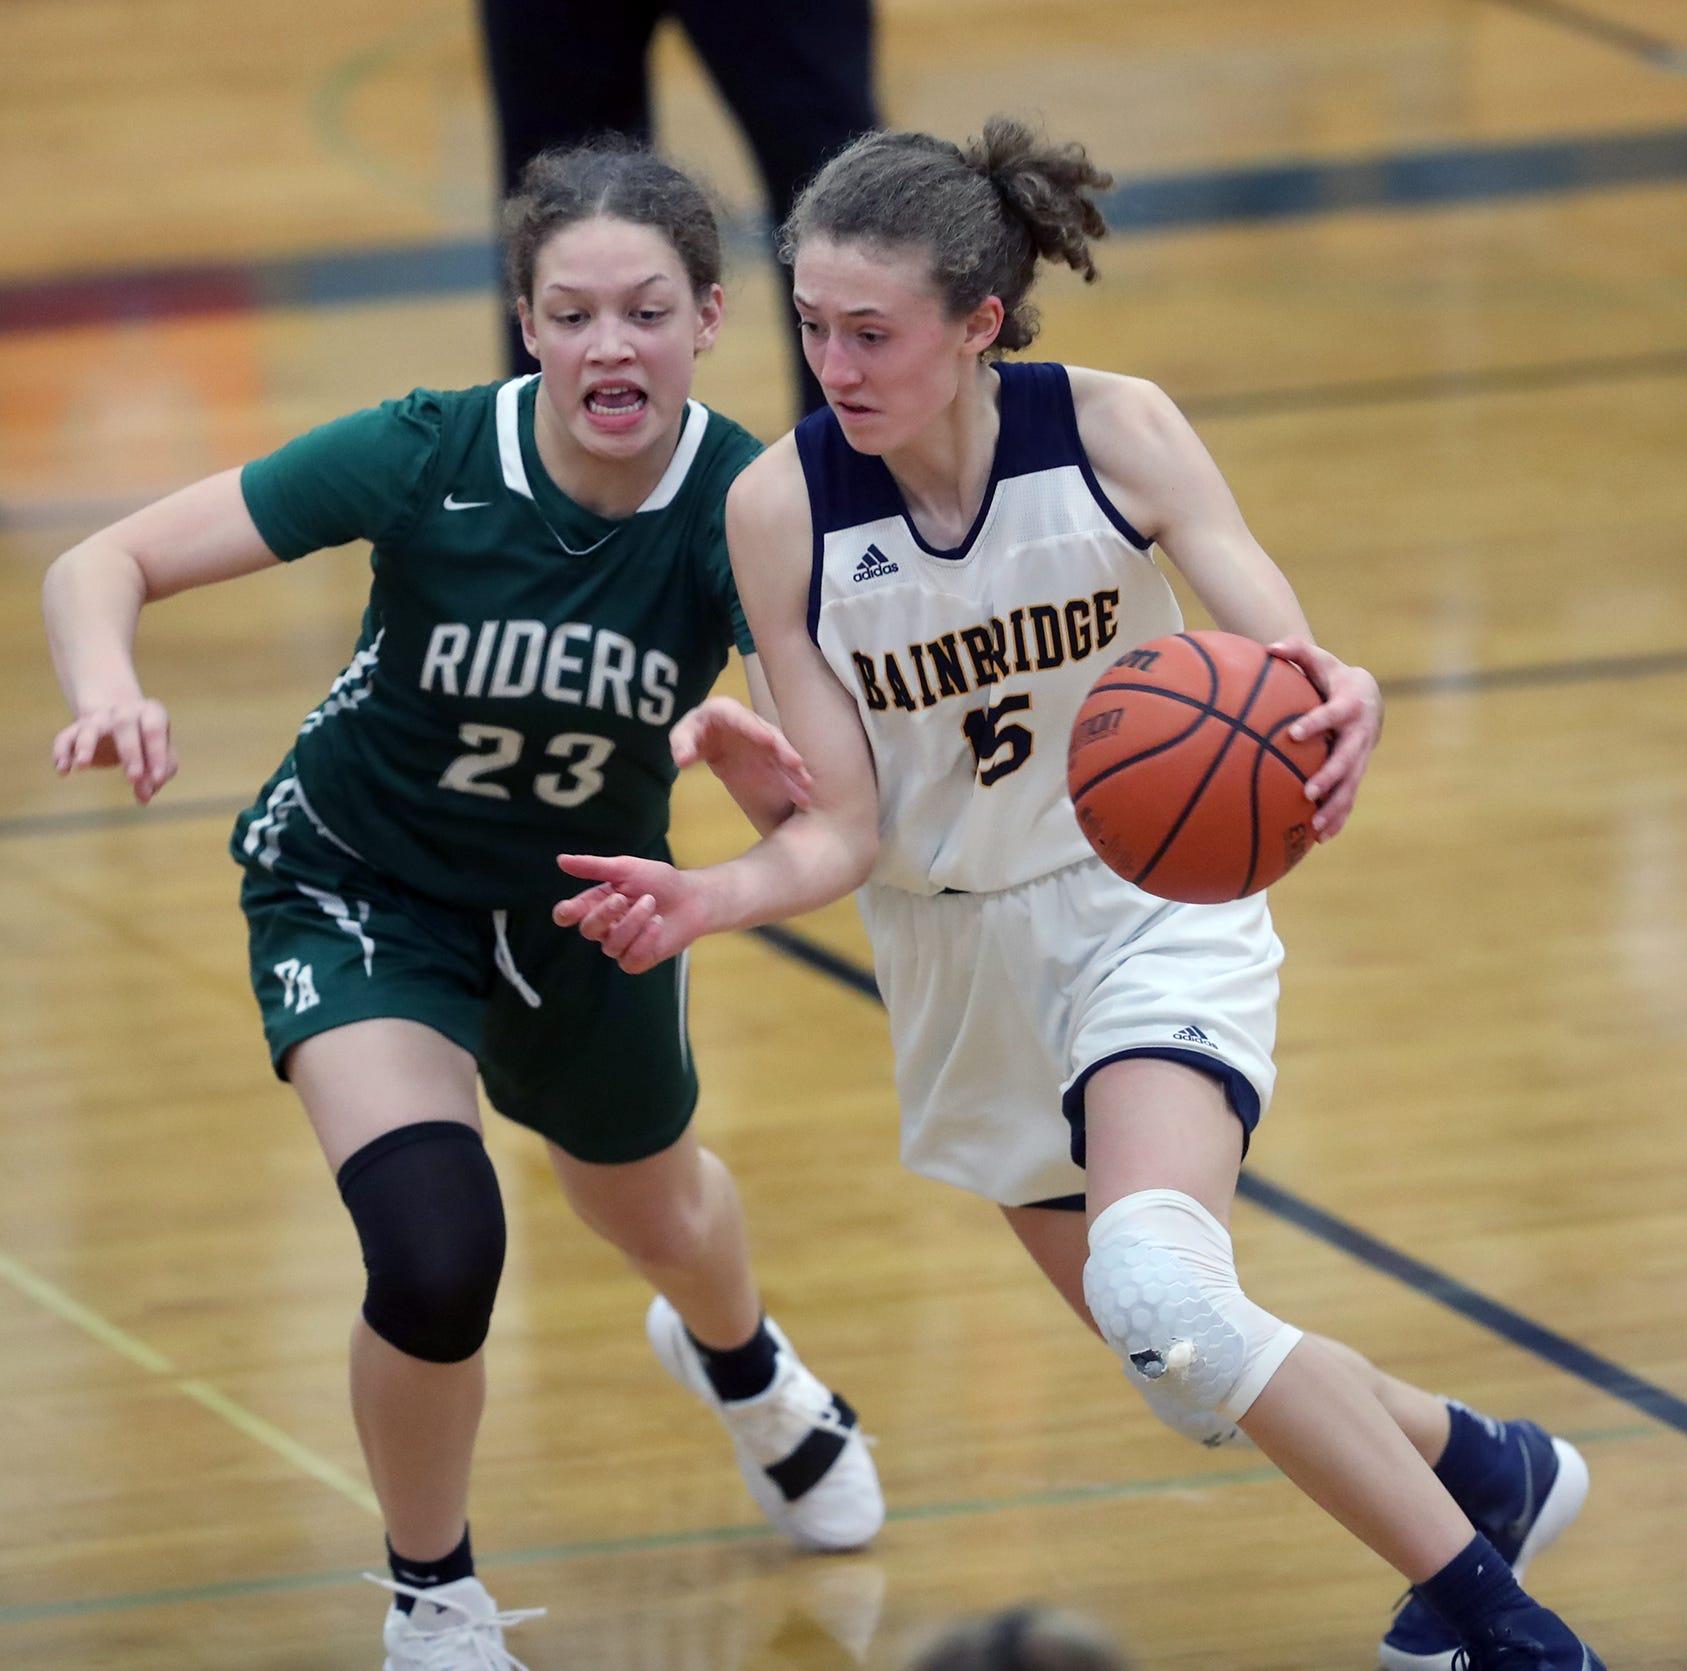 Kitsap Sun girls basketball player of the year: Bainbridge's Olivia Wikstrom